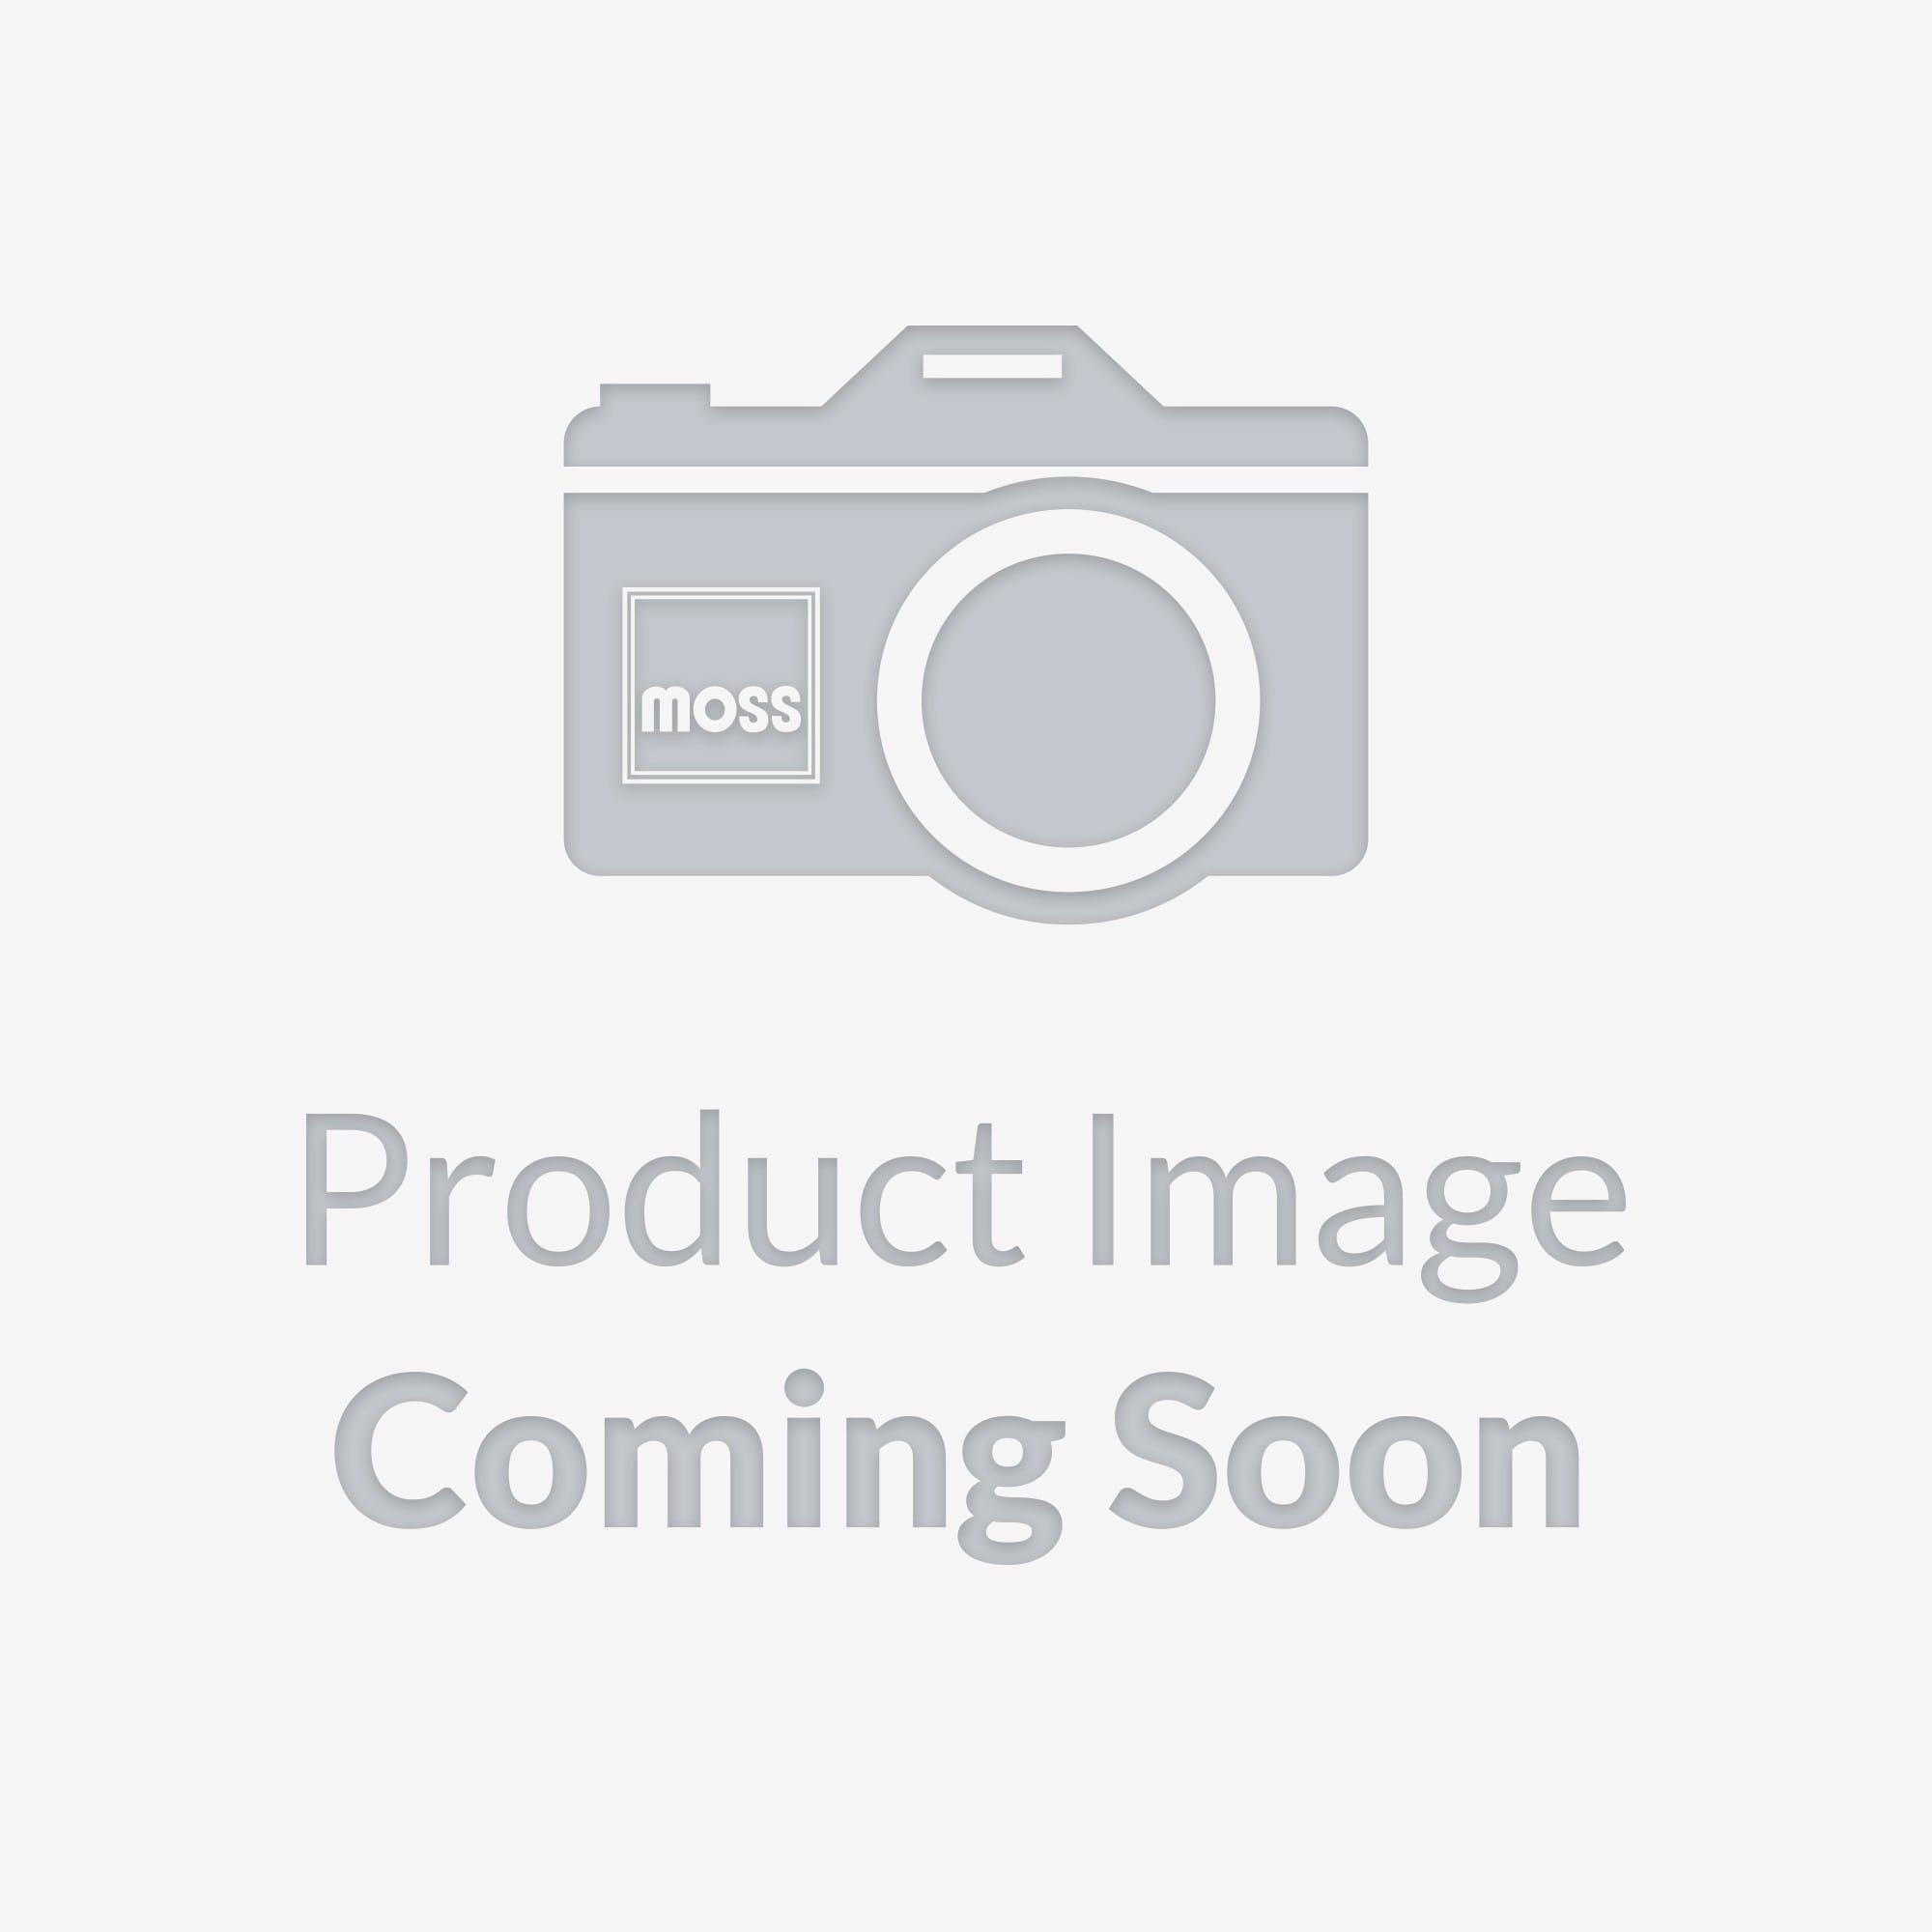 Velour Seat Covers 1990 1997 Mx 5 Miata Mossmiata